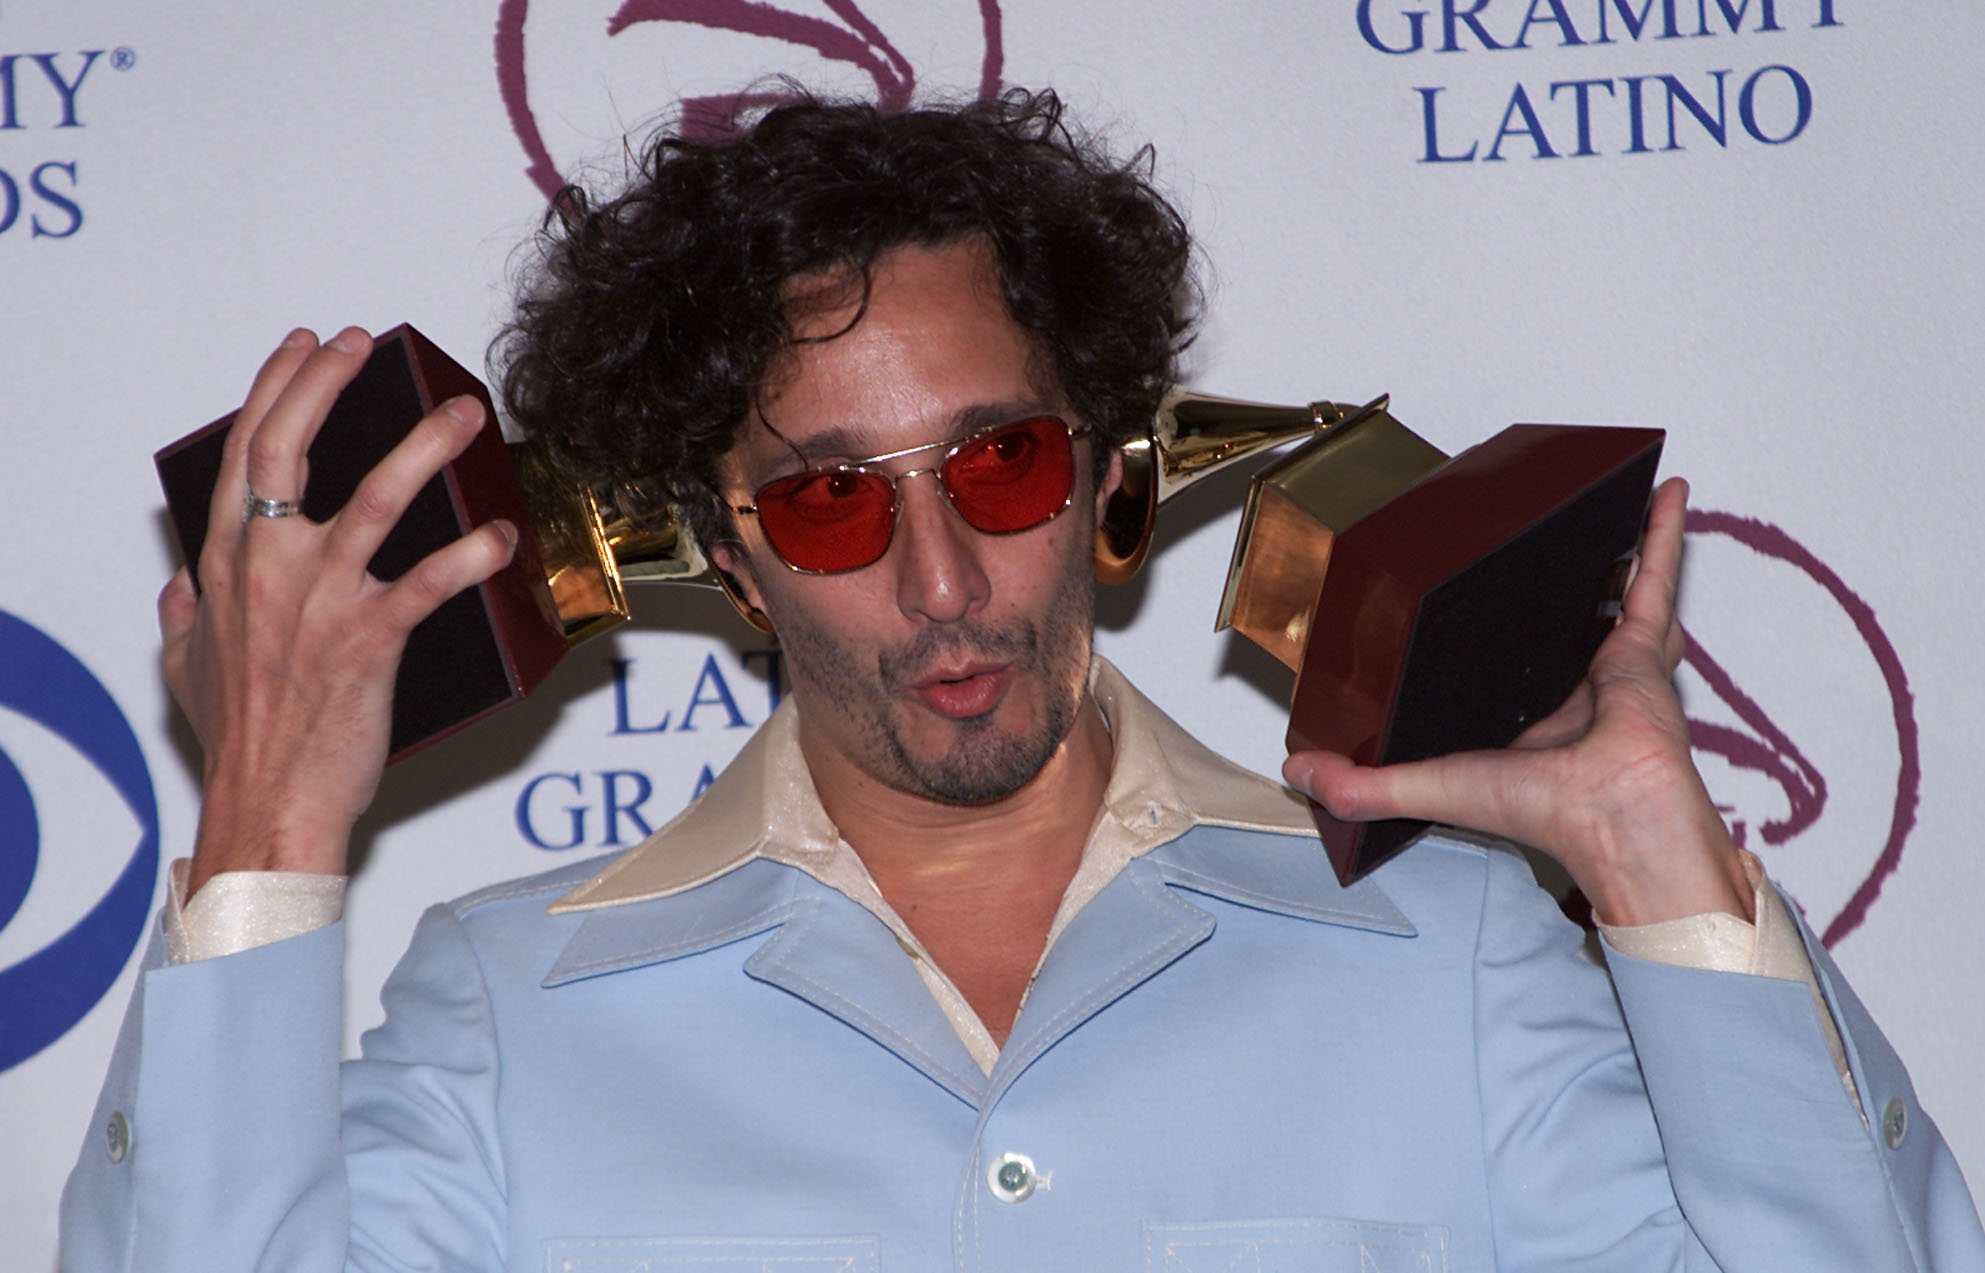 Latin rock star Fito Paez